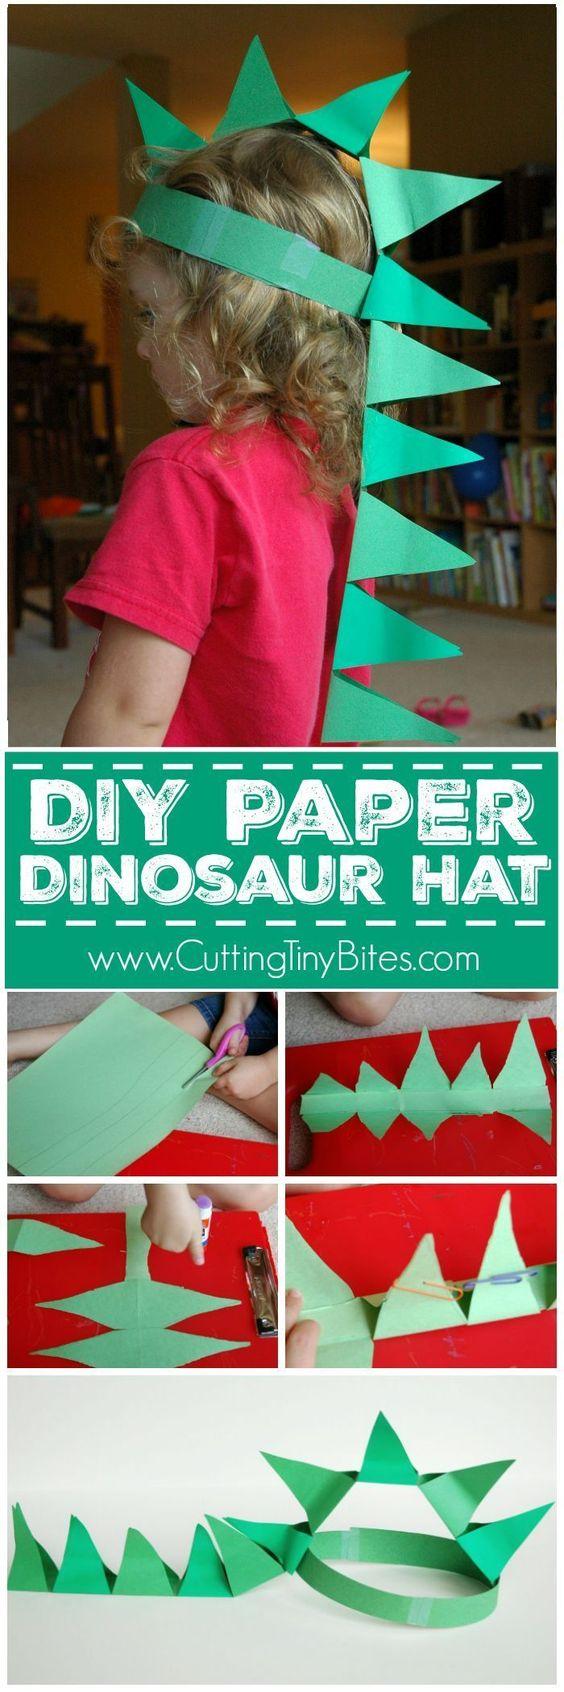 DIY Paper Dinosaur Hat.